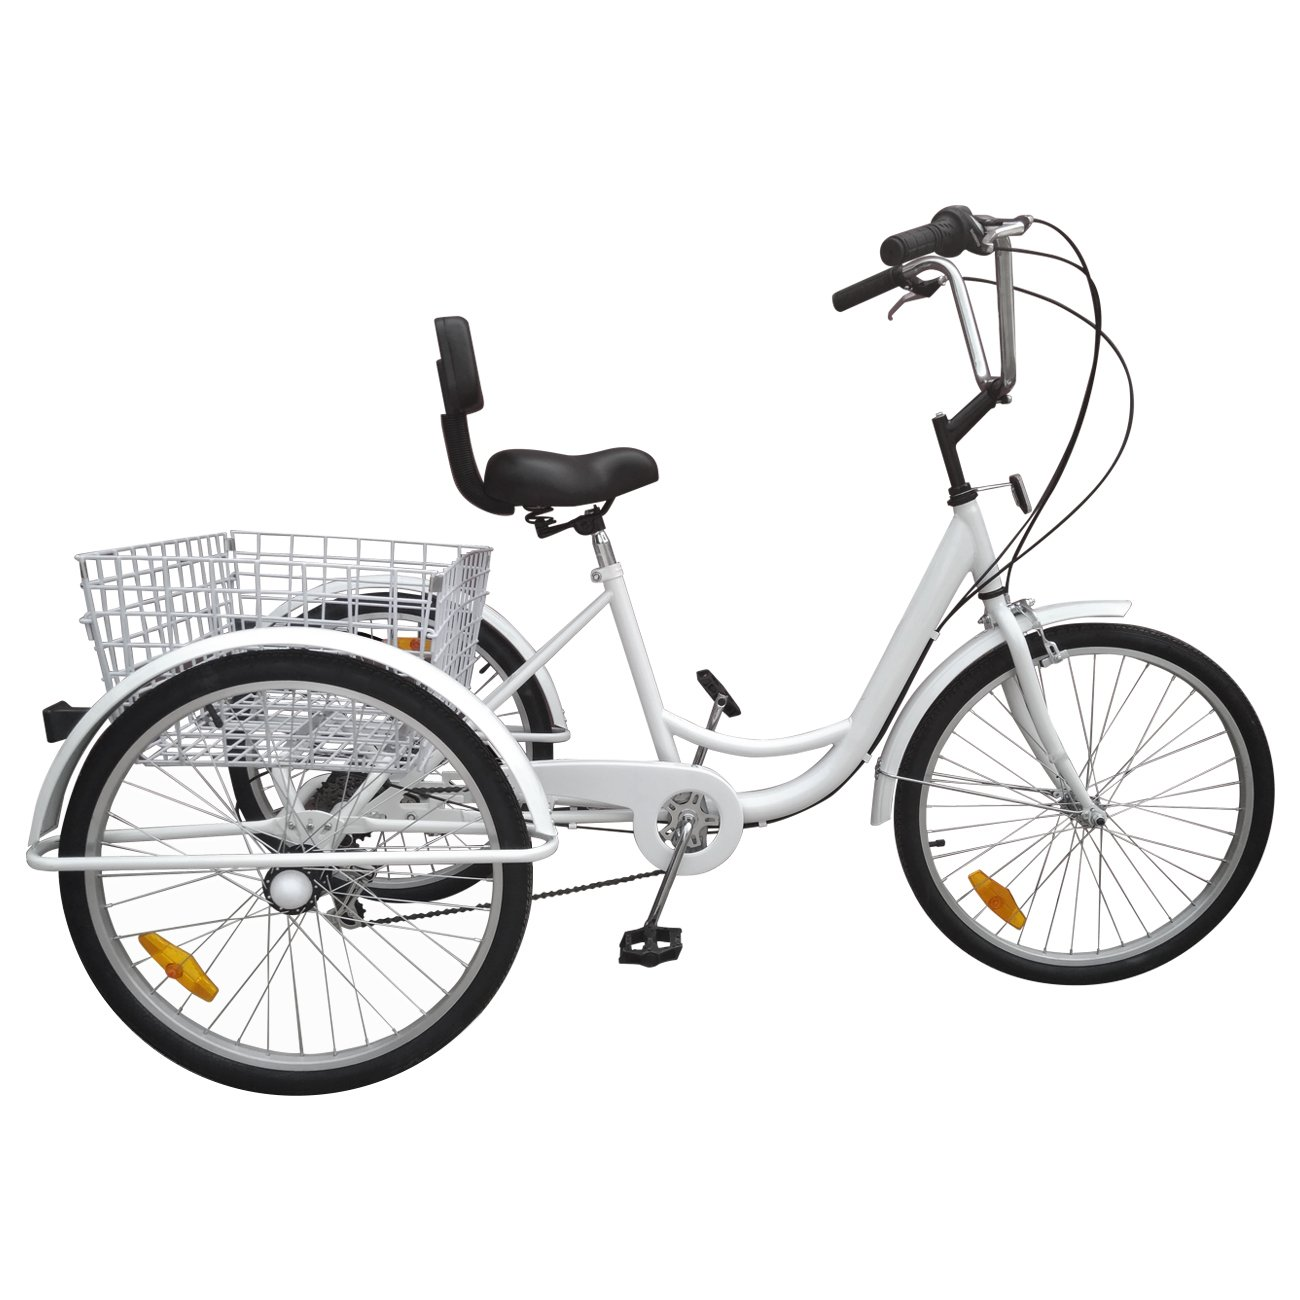 Bici a 3 ruote Urban Paneltech per adulti 6 velocitàe cestino05